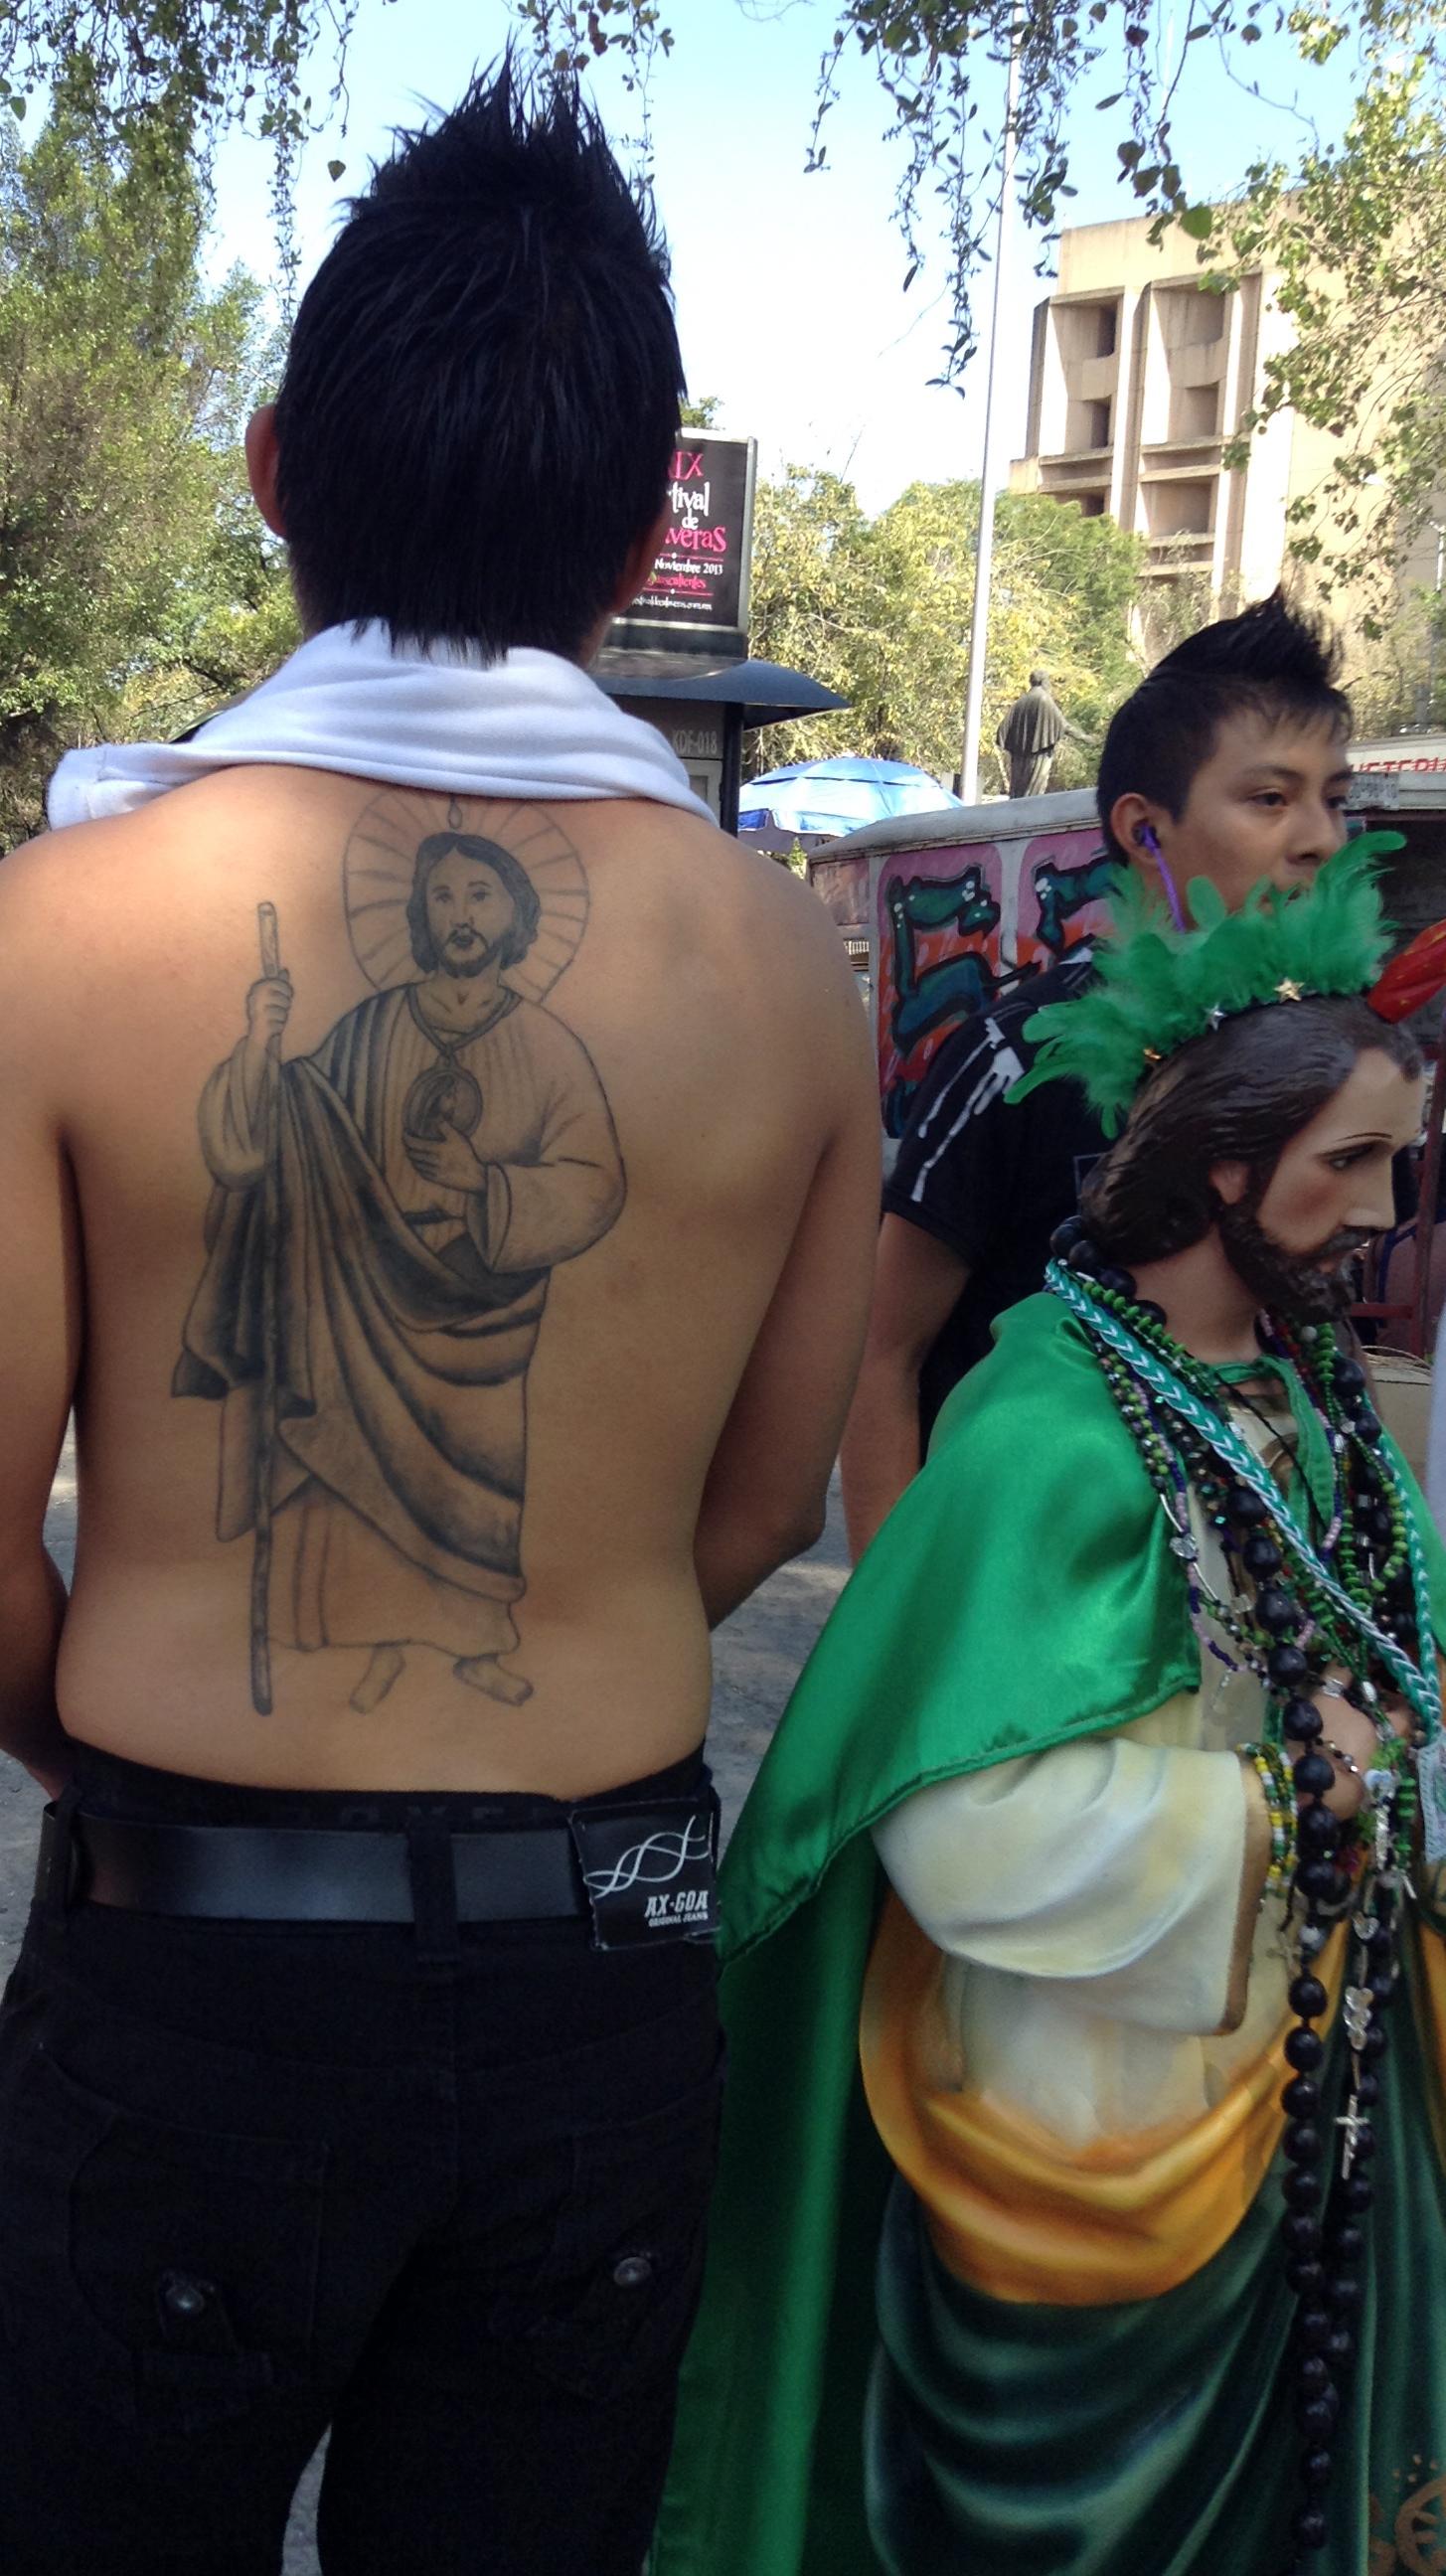 Devoción A San Judas Tadeo Chilango